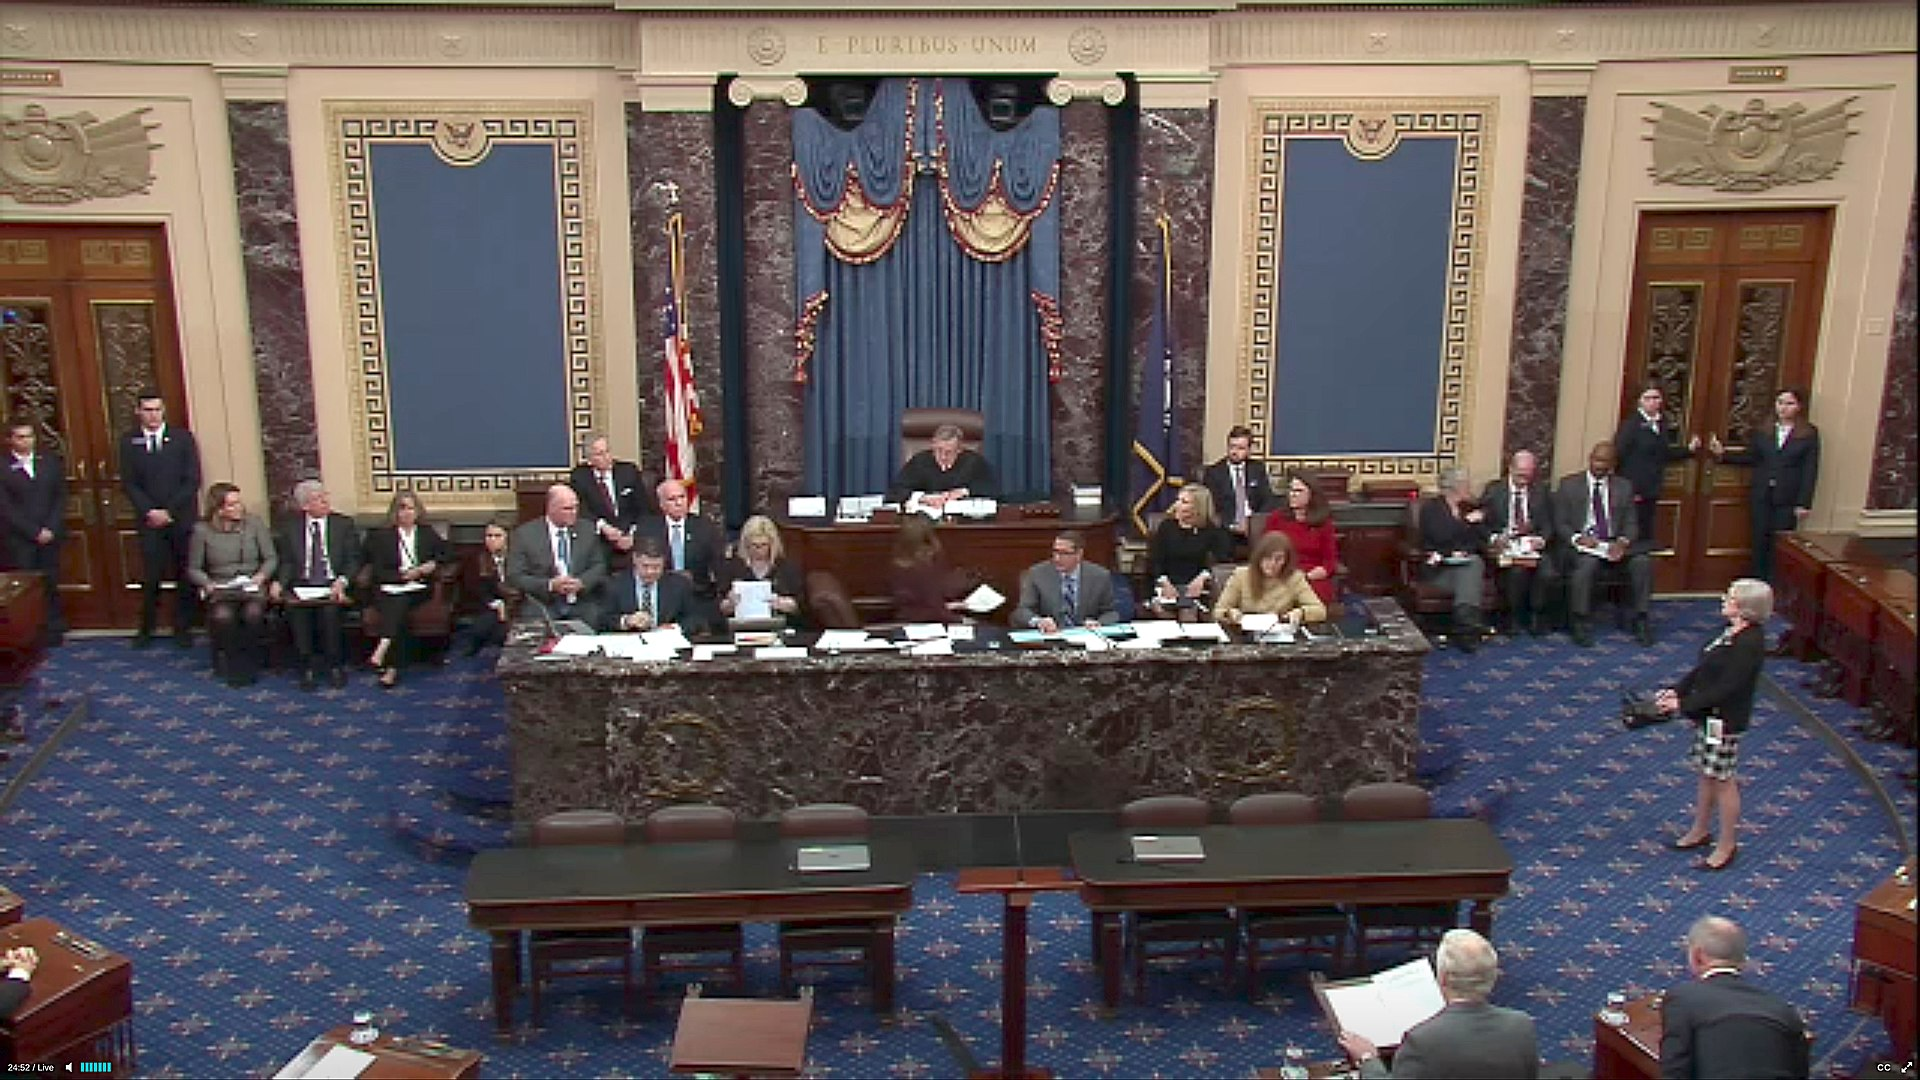 impeachment trial of President Donald J. Trump